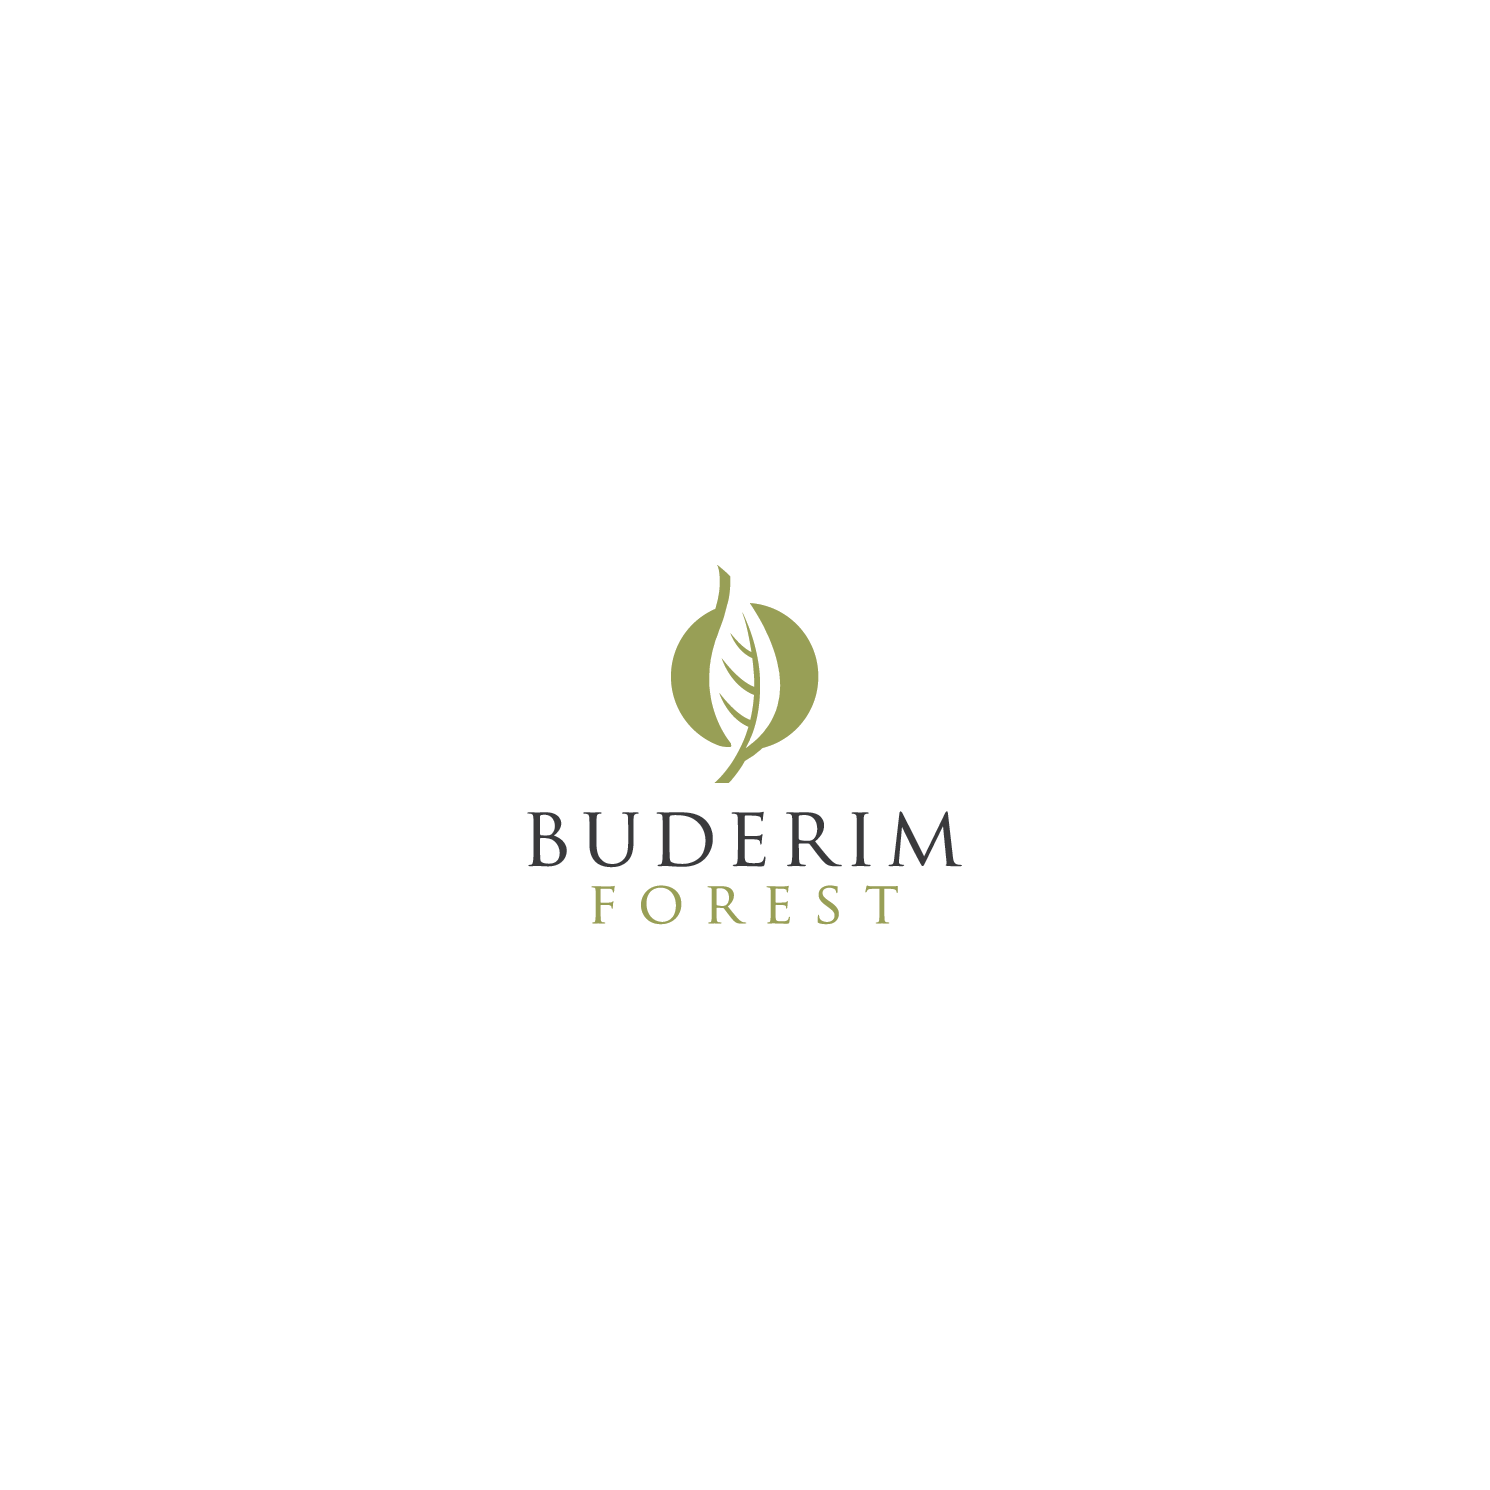 Serious, Conservative, Real Estate Development Logo Design for ...